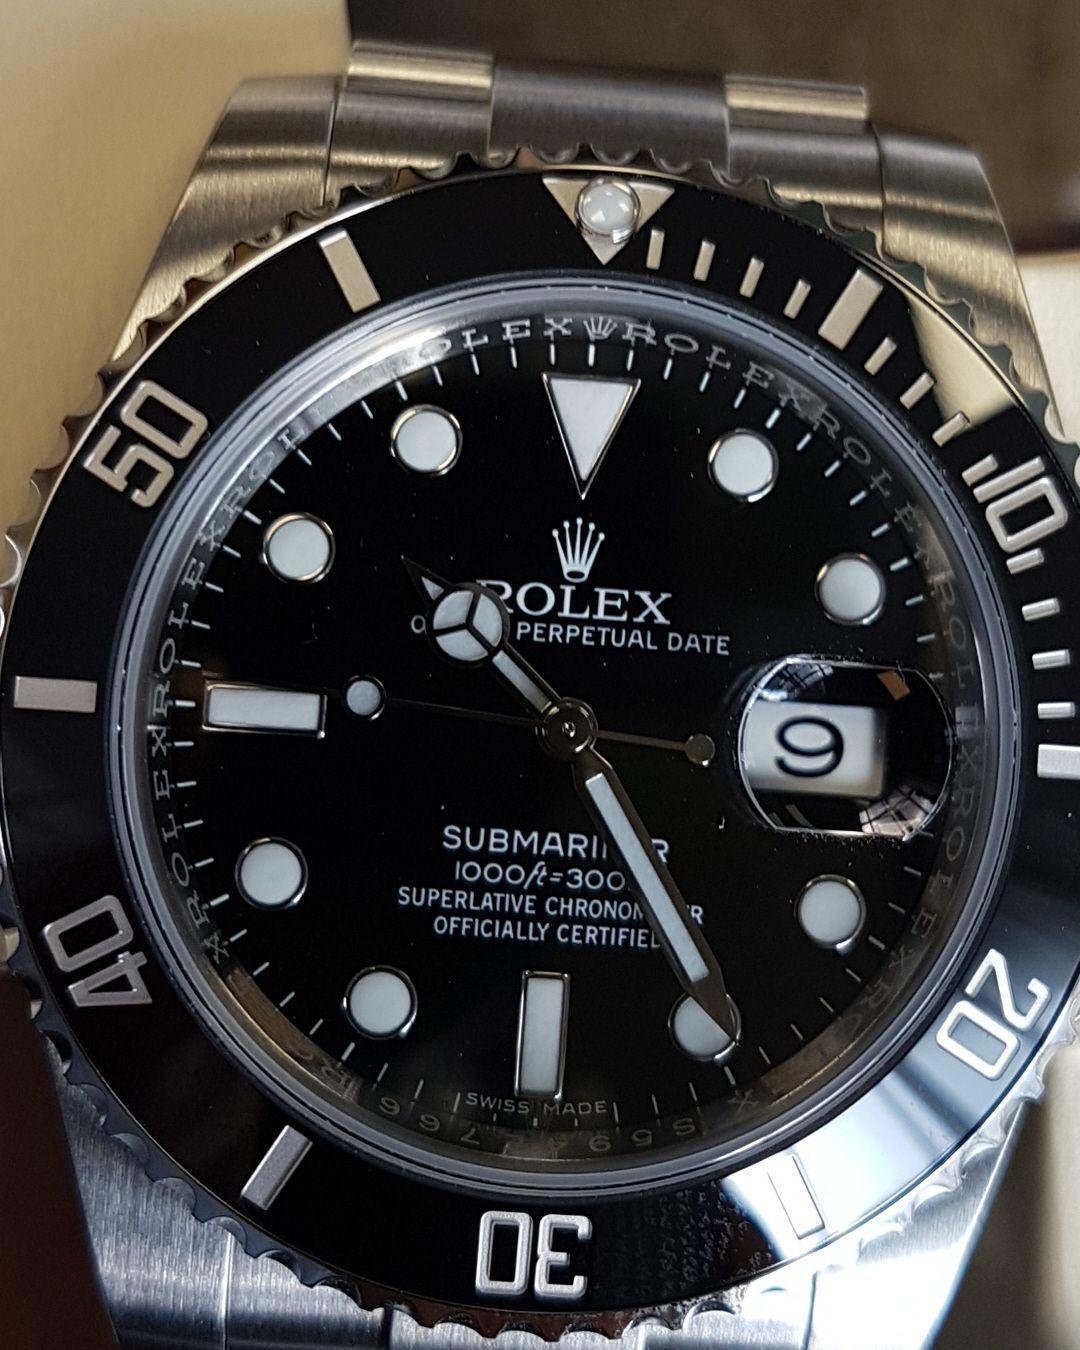 Rolex Submariner 116610LN Rolex, Rolex submariner, Rolex